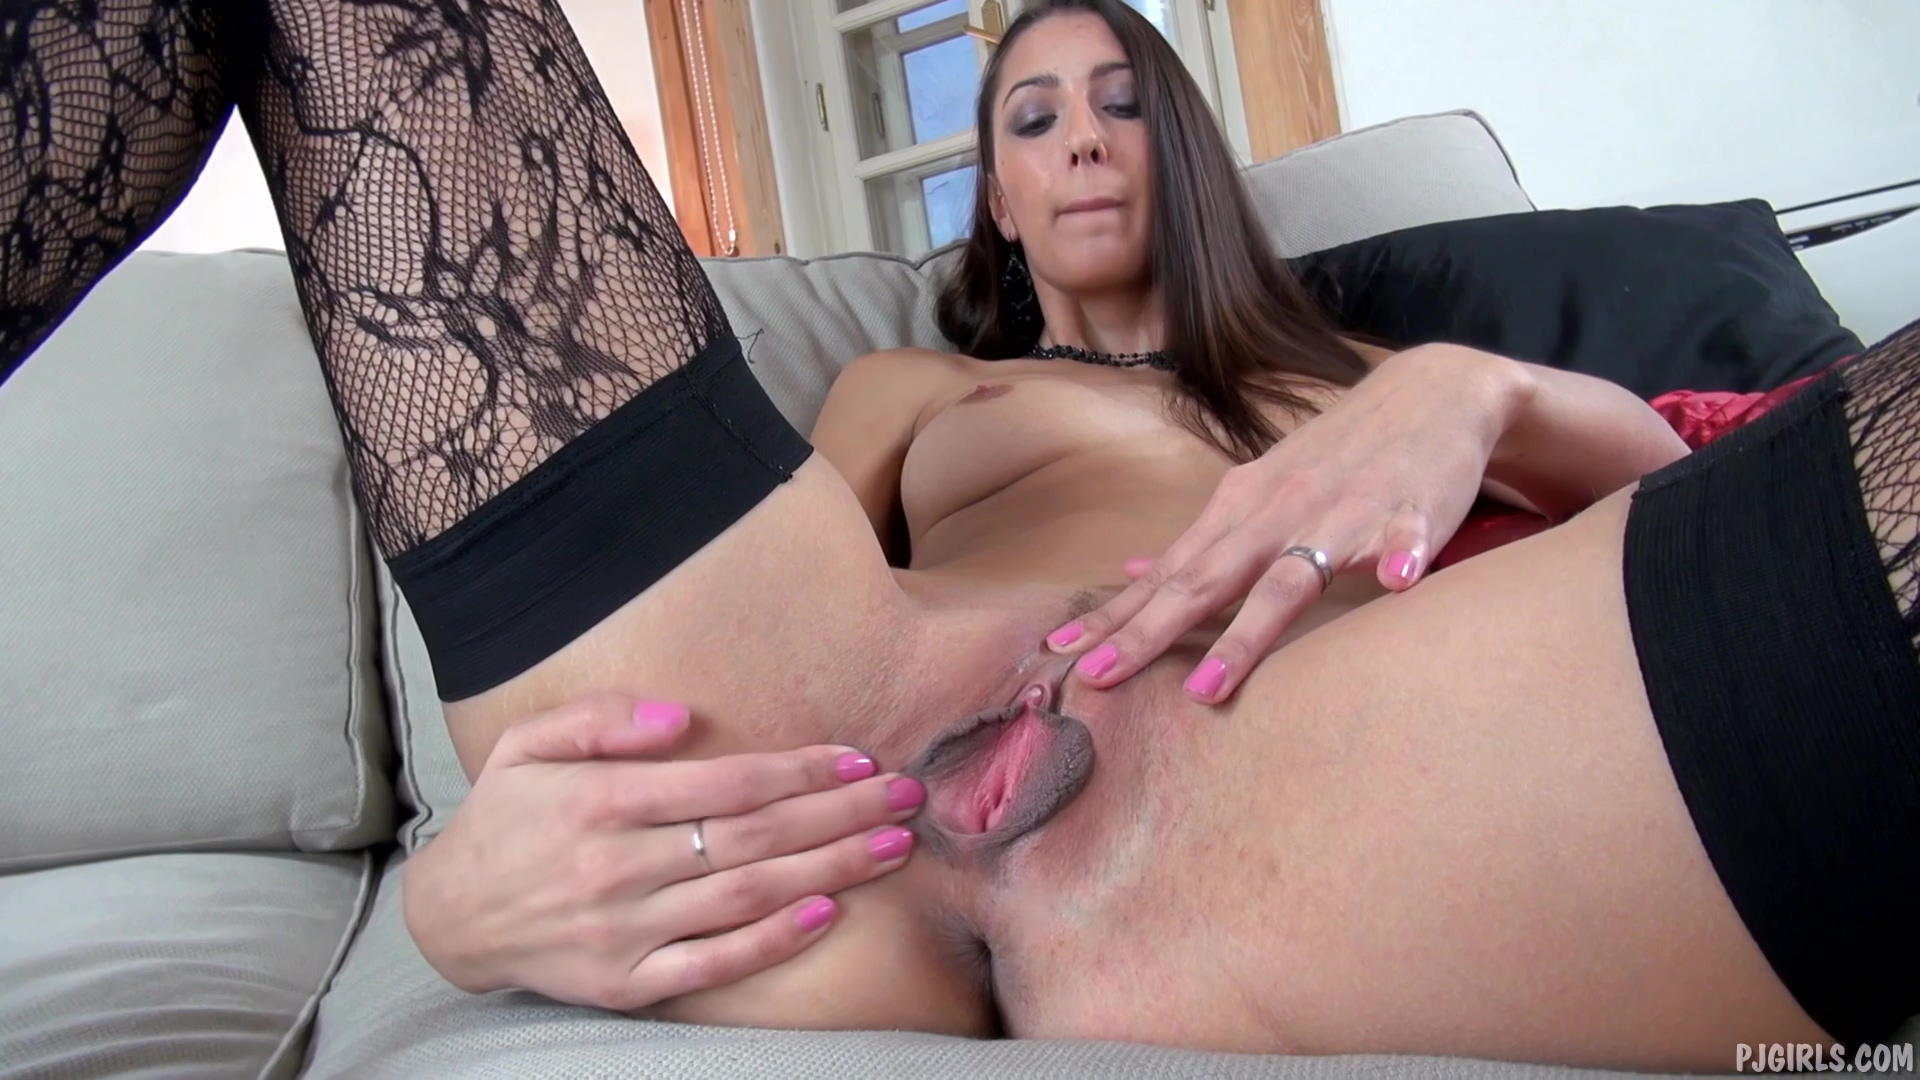 Video 1496831904: kitty jane, milf solo big tit, milf stockings solo, milf gaping, brunette milf solo, milf solo hd, solo female big tits